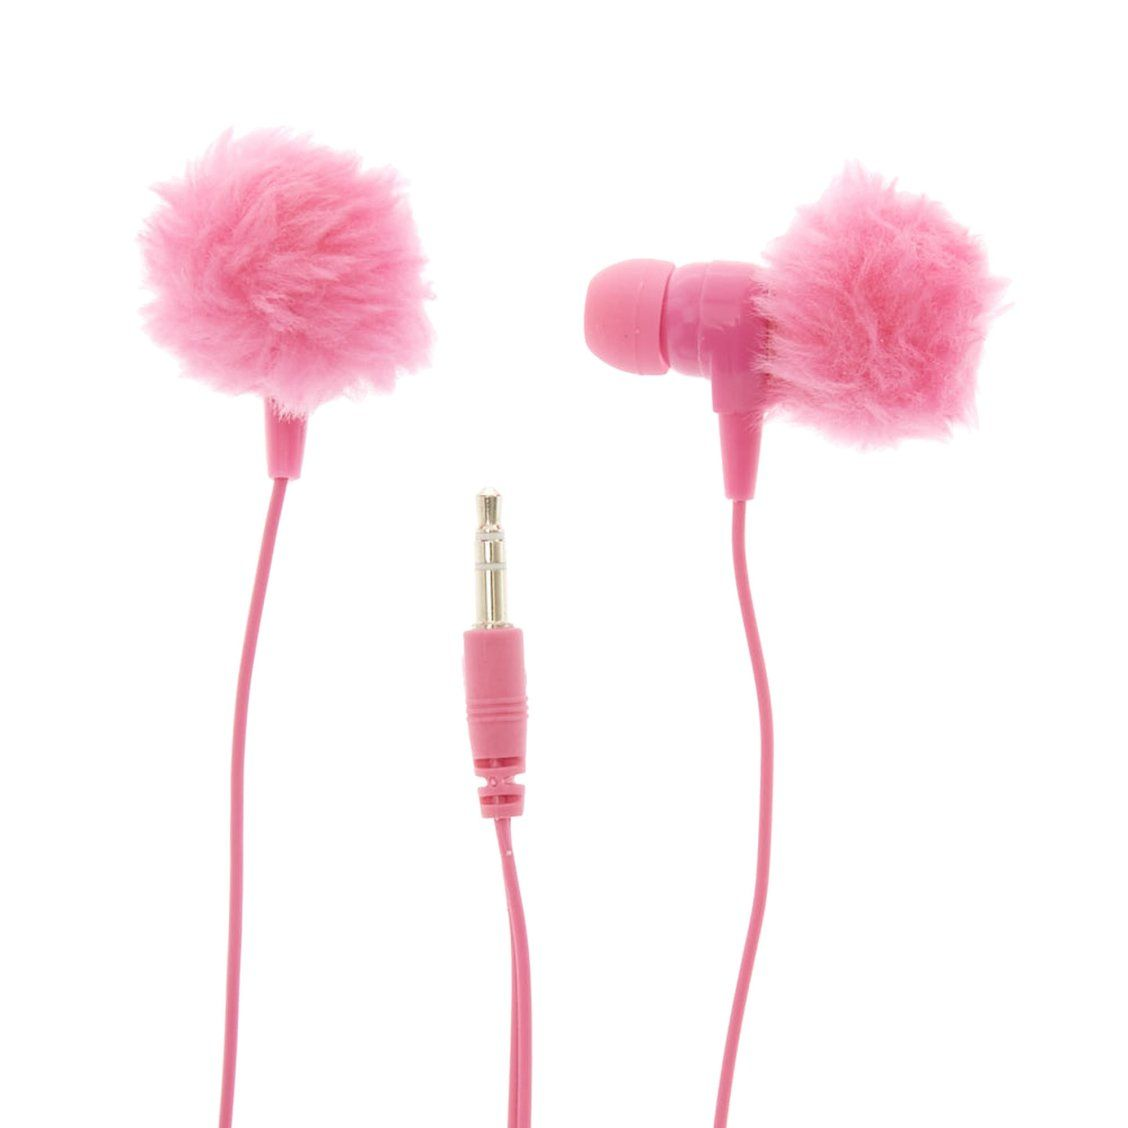 Pink Pom Pom Earbud Headphones Wired Headphones Feature Pink Pom Pom Earbuds Perfect For Adding A Acessorios Para Celular Fones De Ouvido Acessorios Vintage